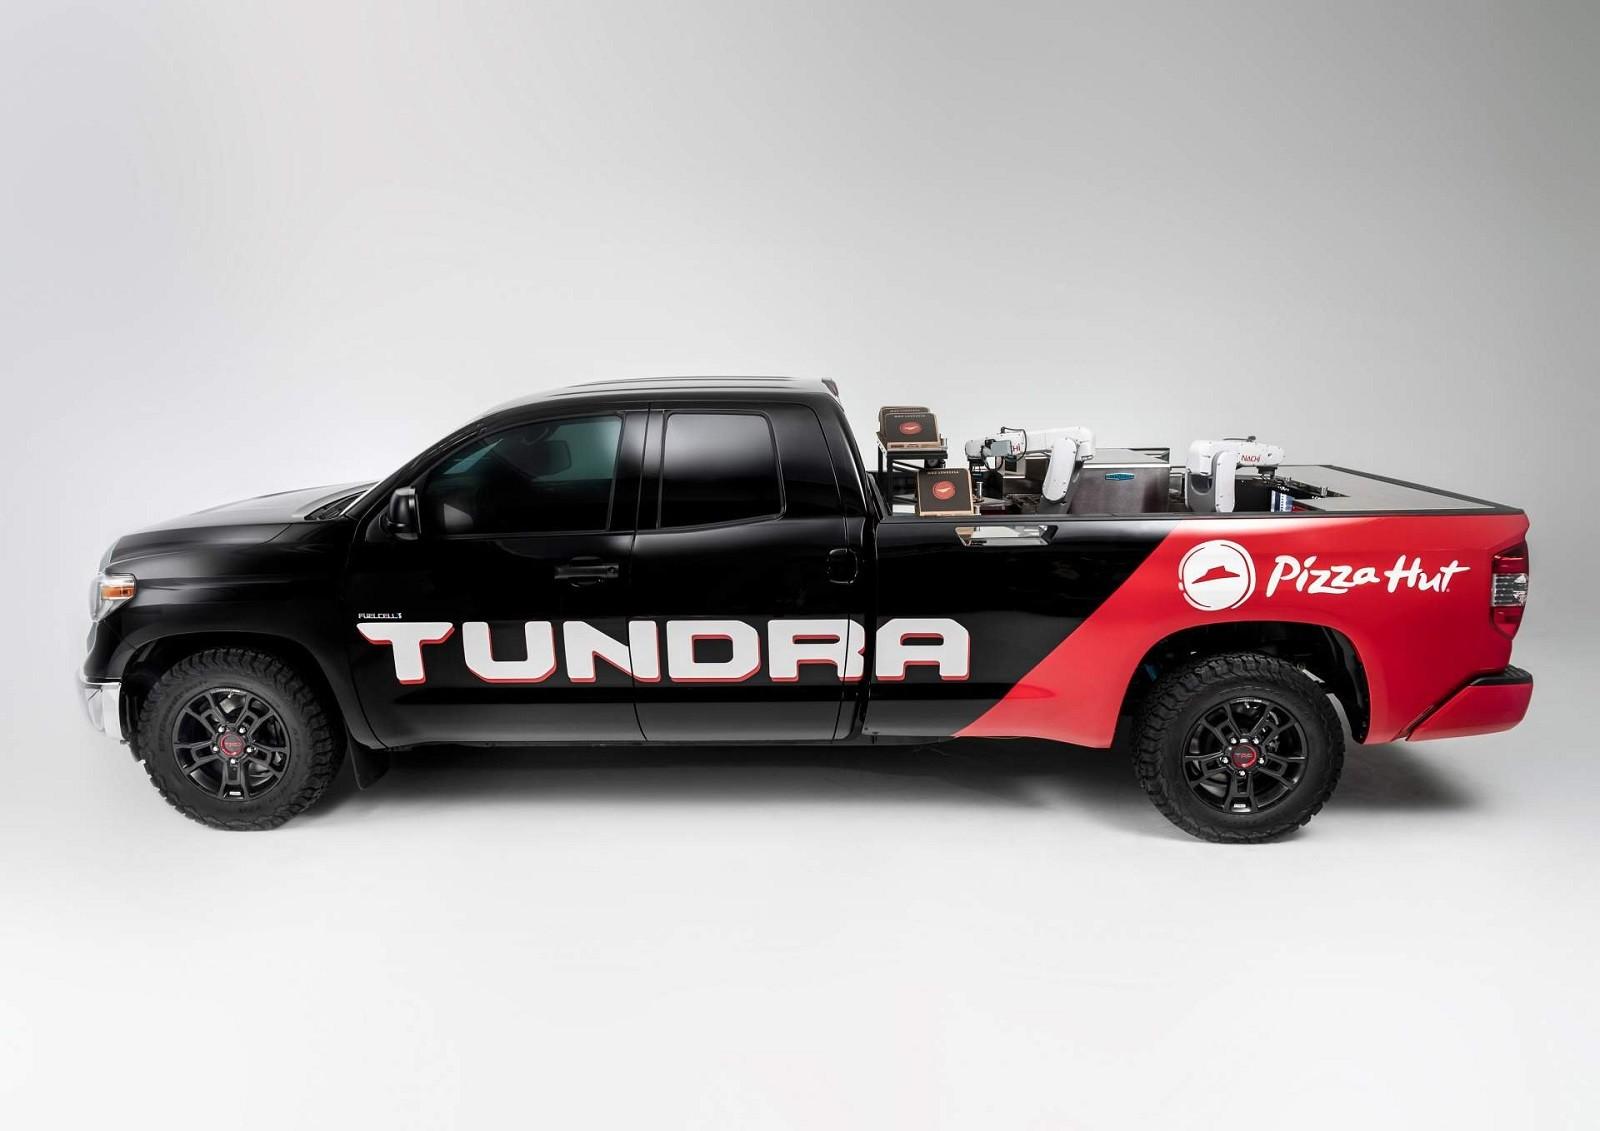 Foto de Toyota Tundra Pie Pro (2/12)